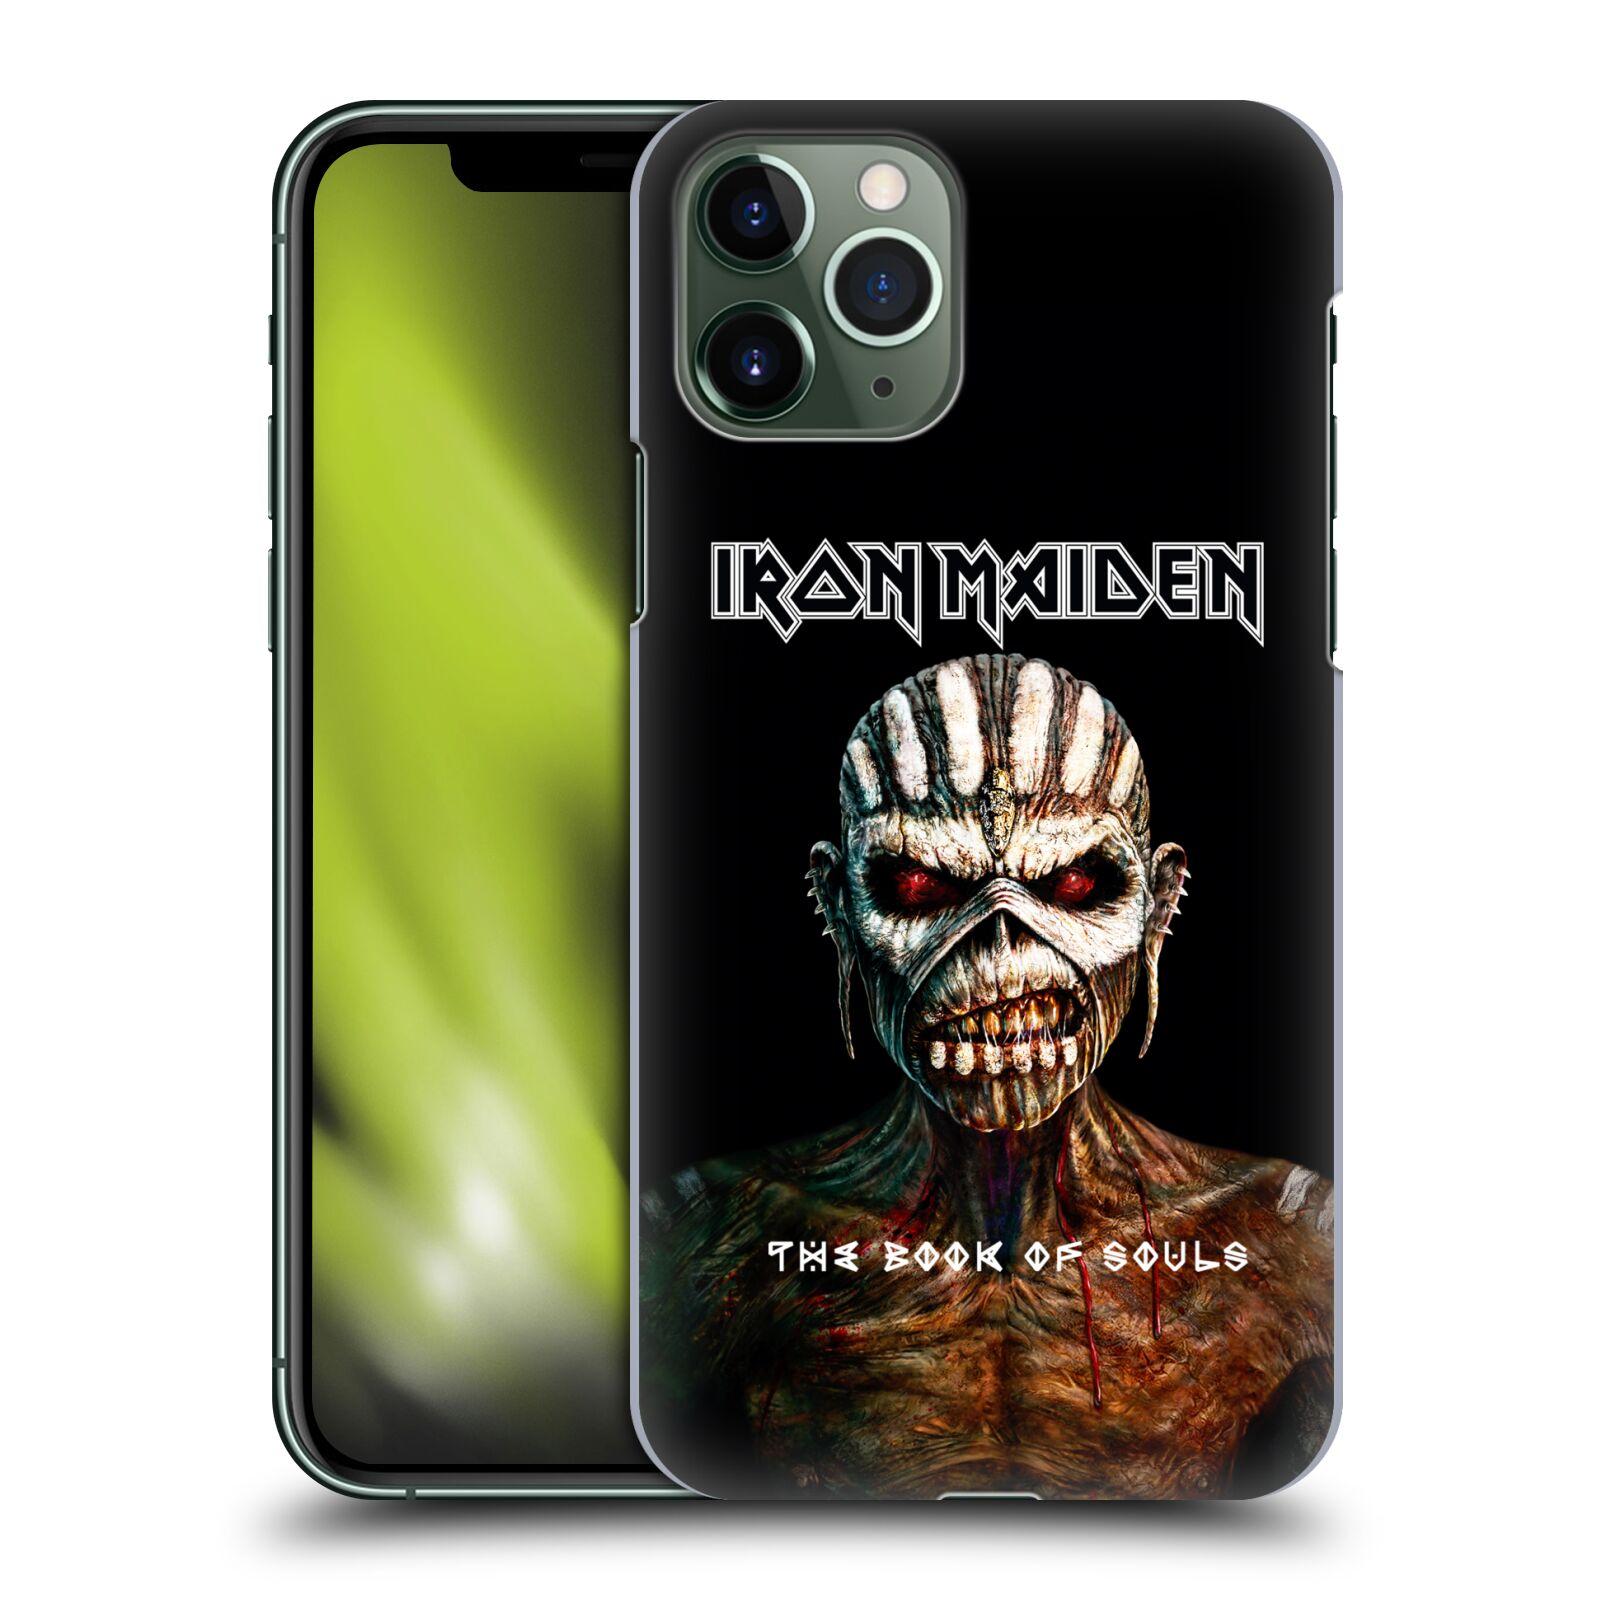 Plastové pouzdro na mobil Apple iPhone 11 Pro - Head Case - Iron Maiden - The Book Of Souls